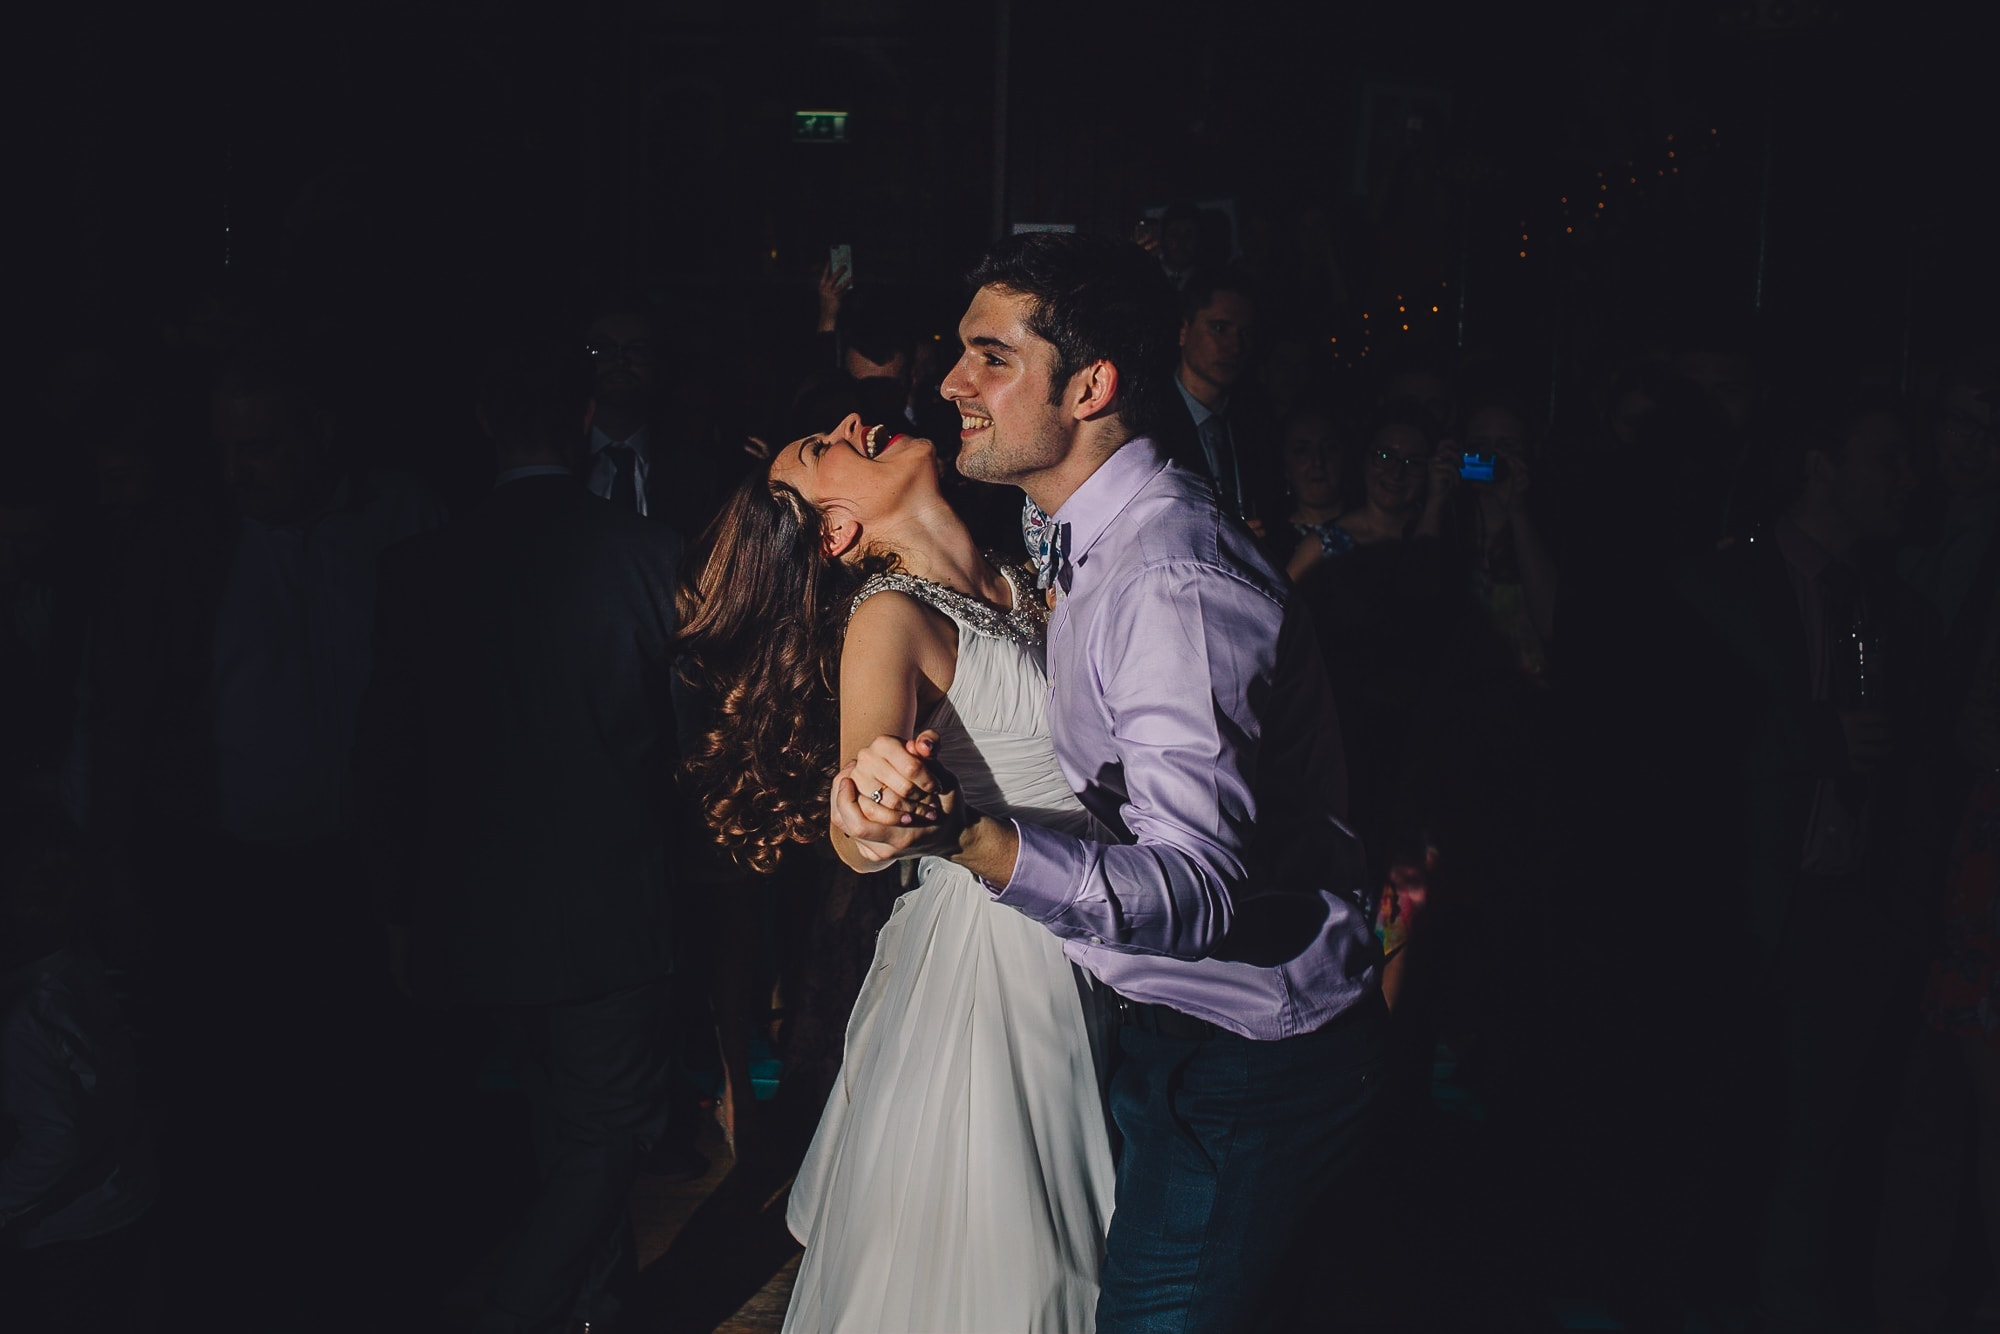 Matlt-Cross-Nottingham-wedding-Photography-48